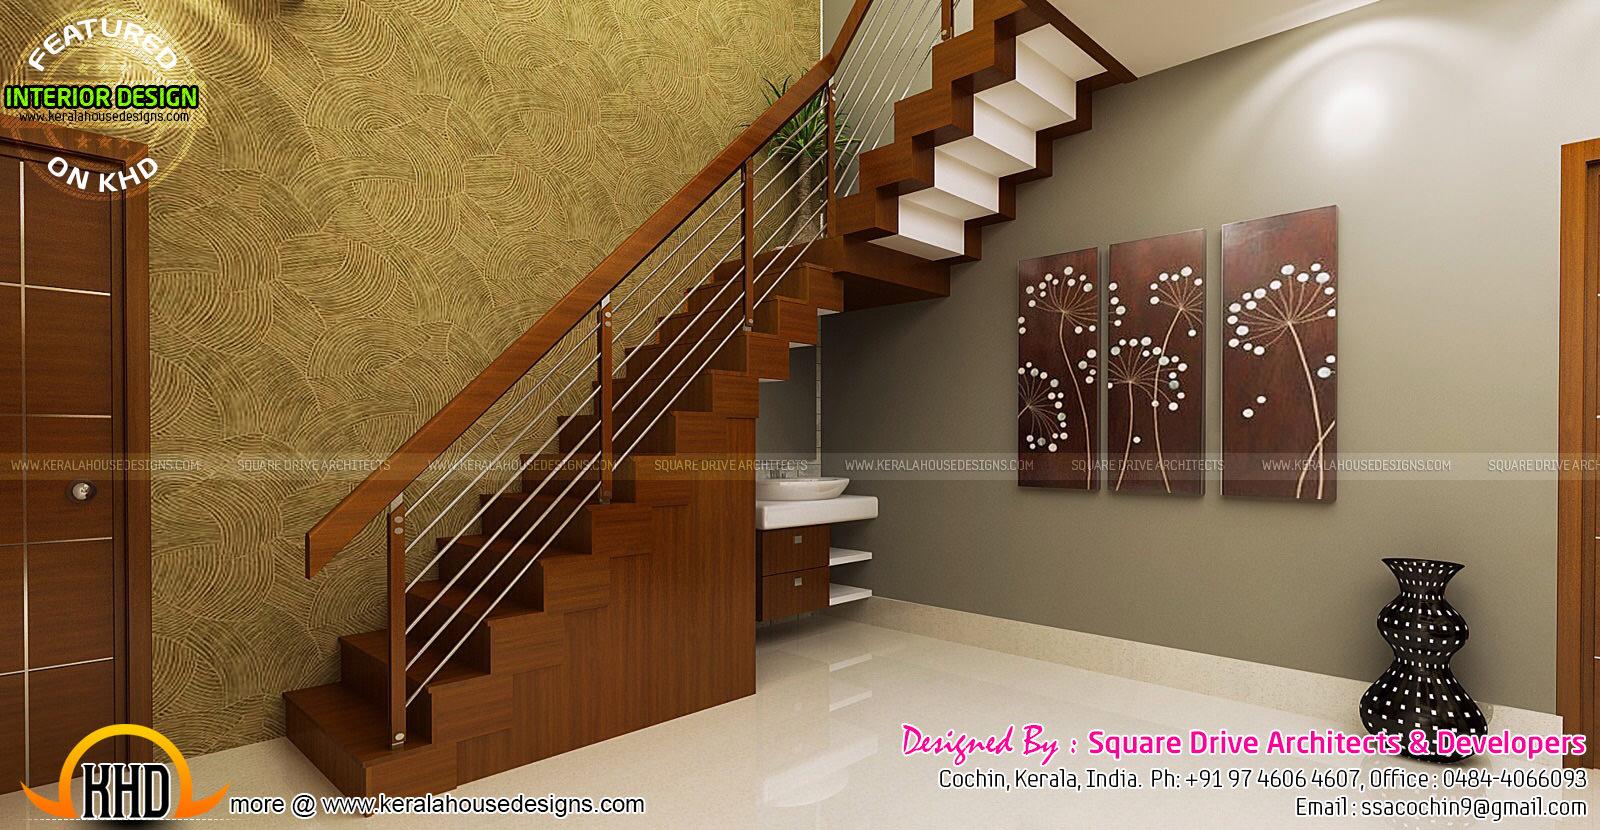 Stair area, Upper living, Bedroom interiors - Kerala home ...